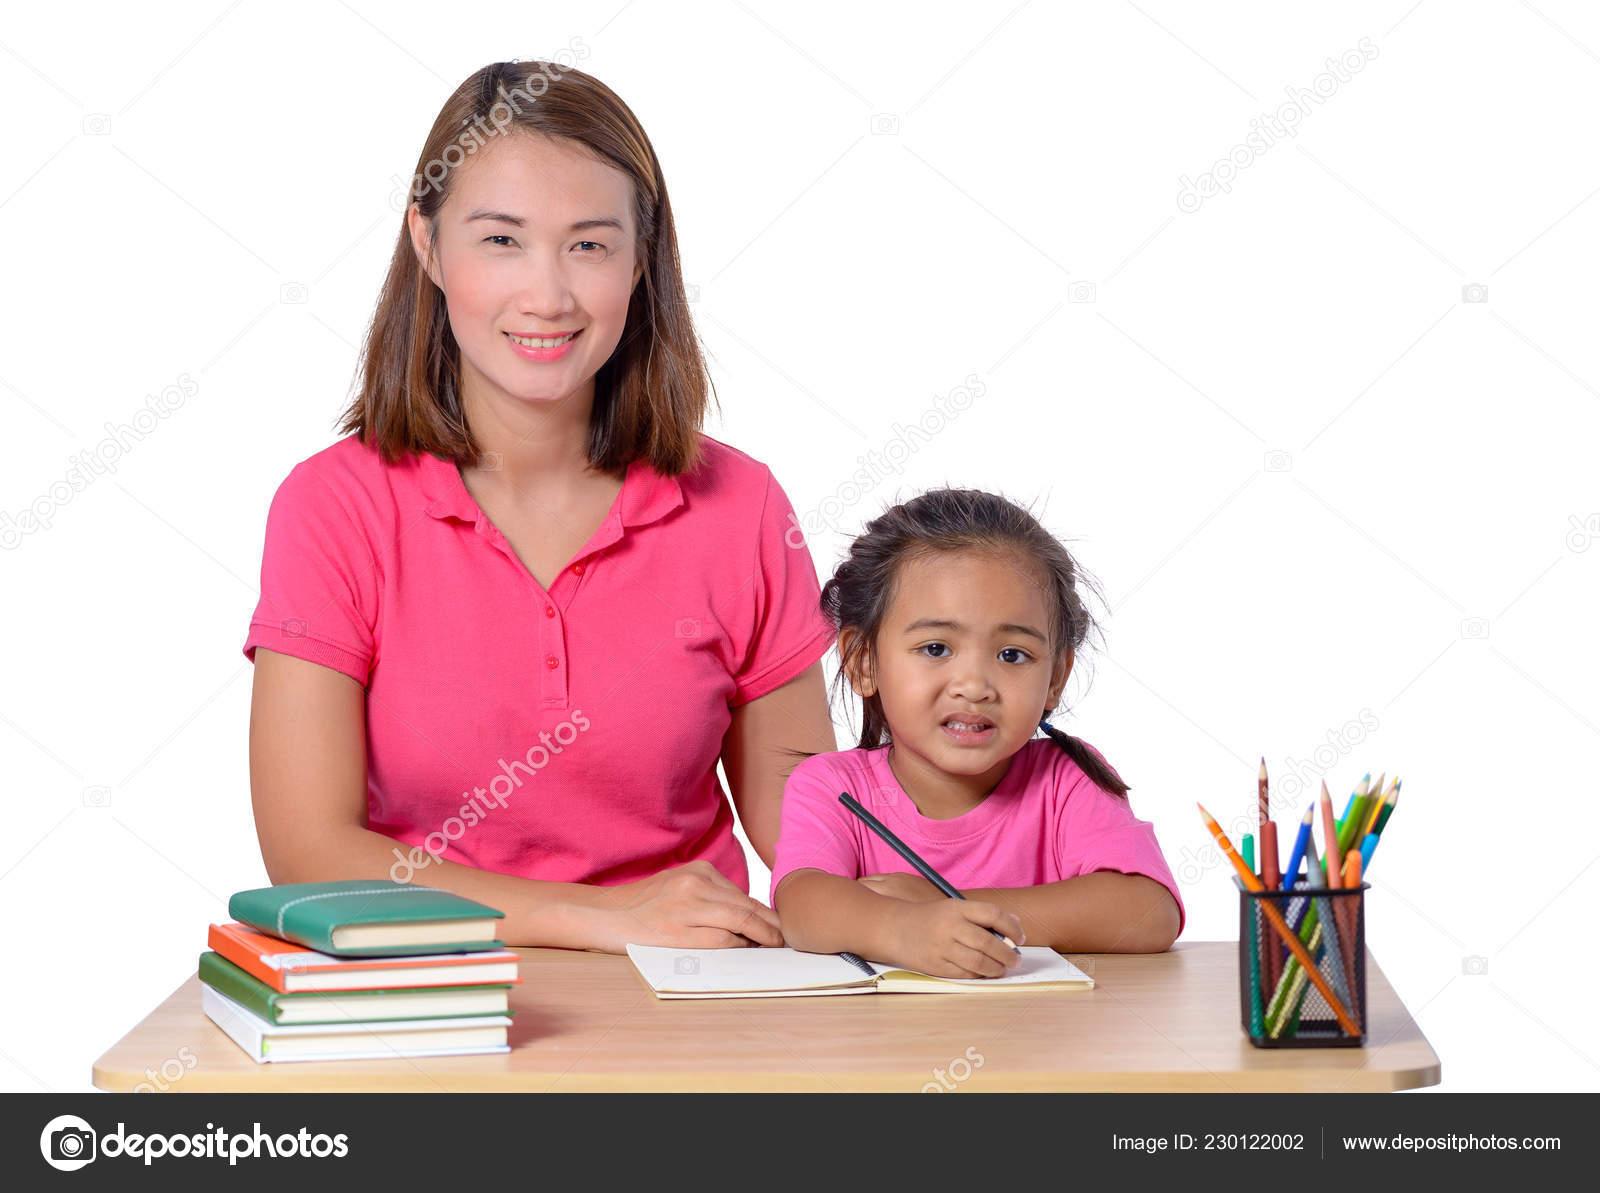 Moms teaching young girls